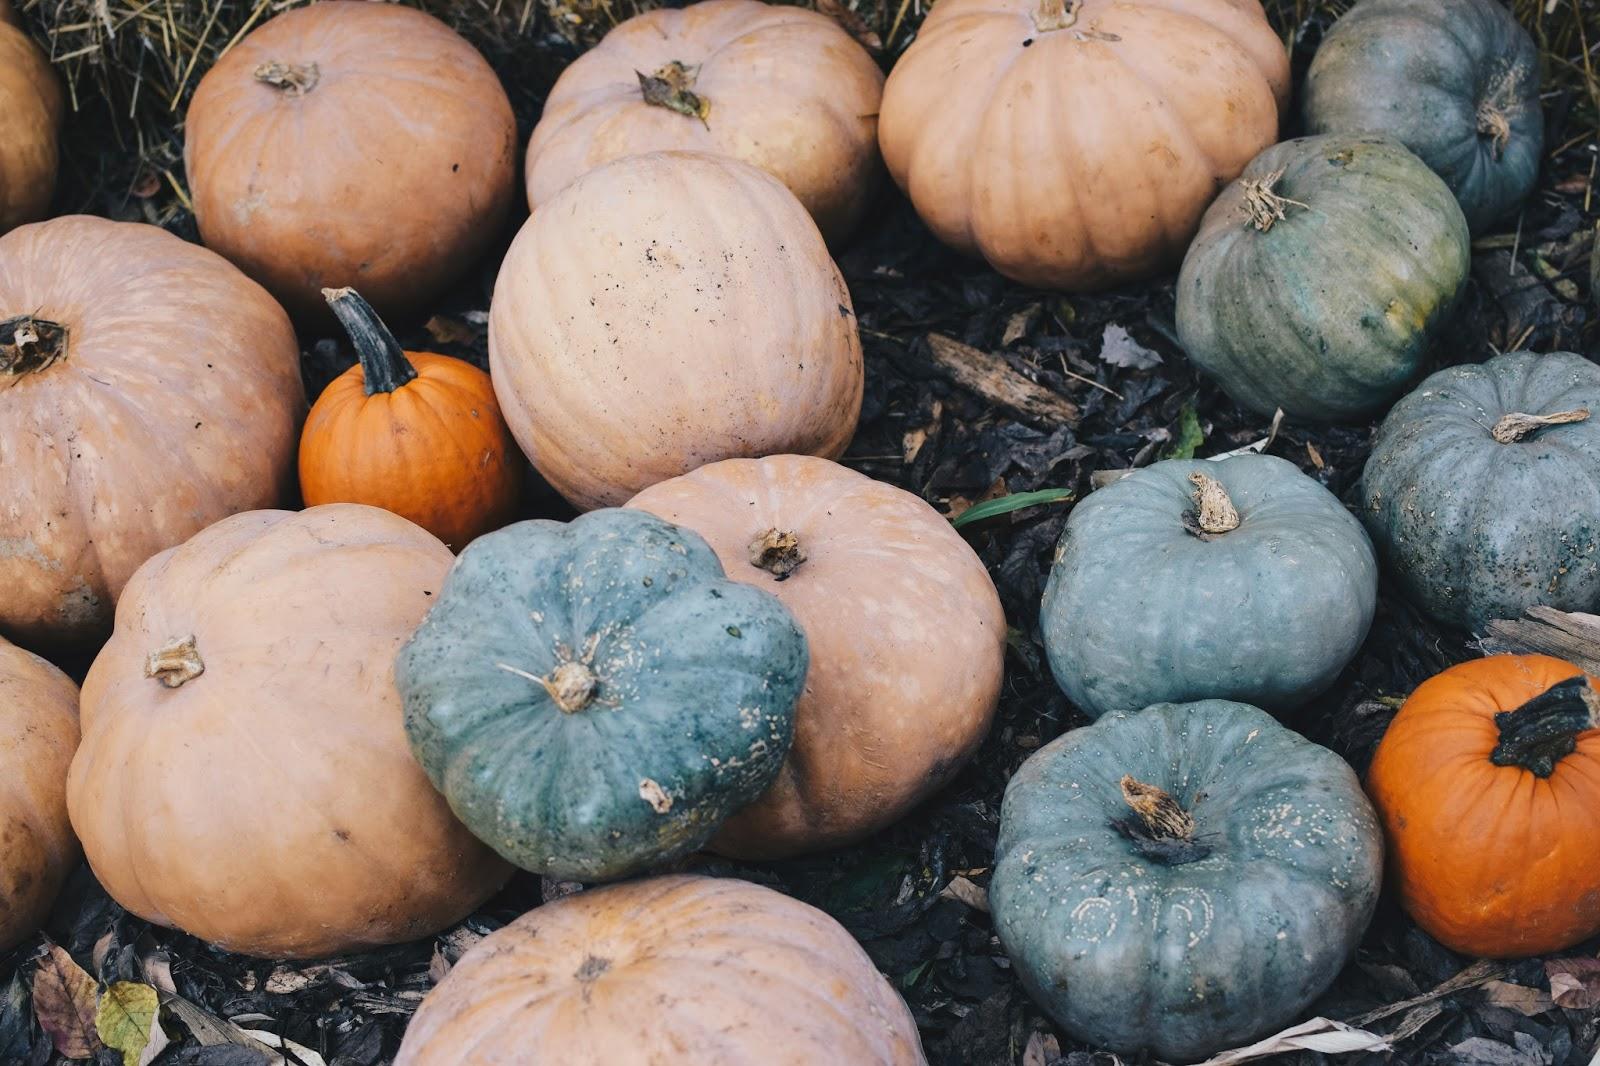 pumpkins at cheekwood estate & gardens